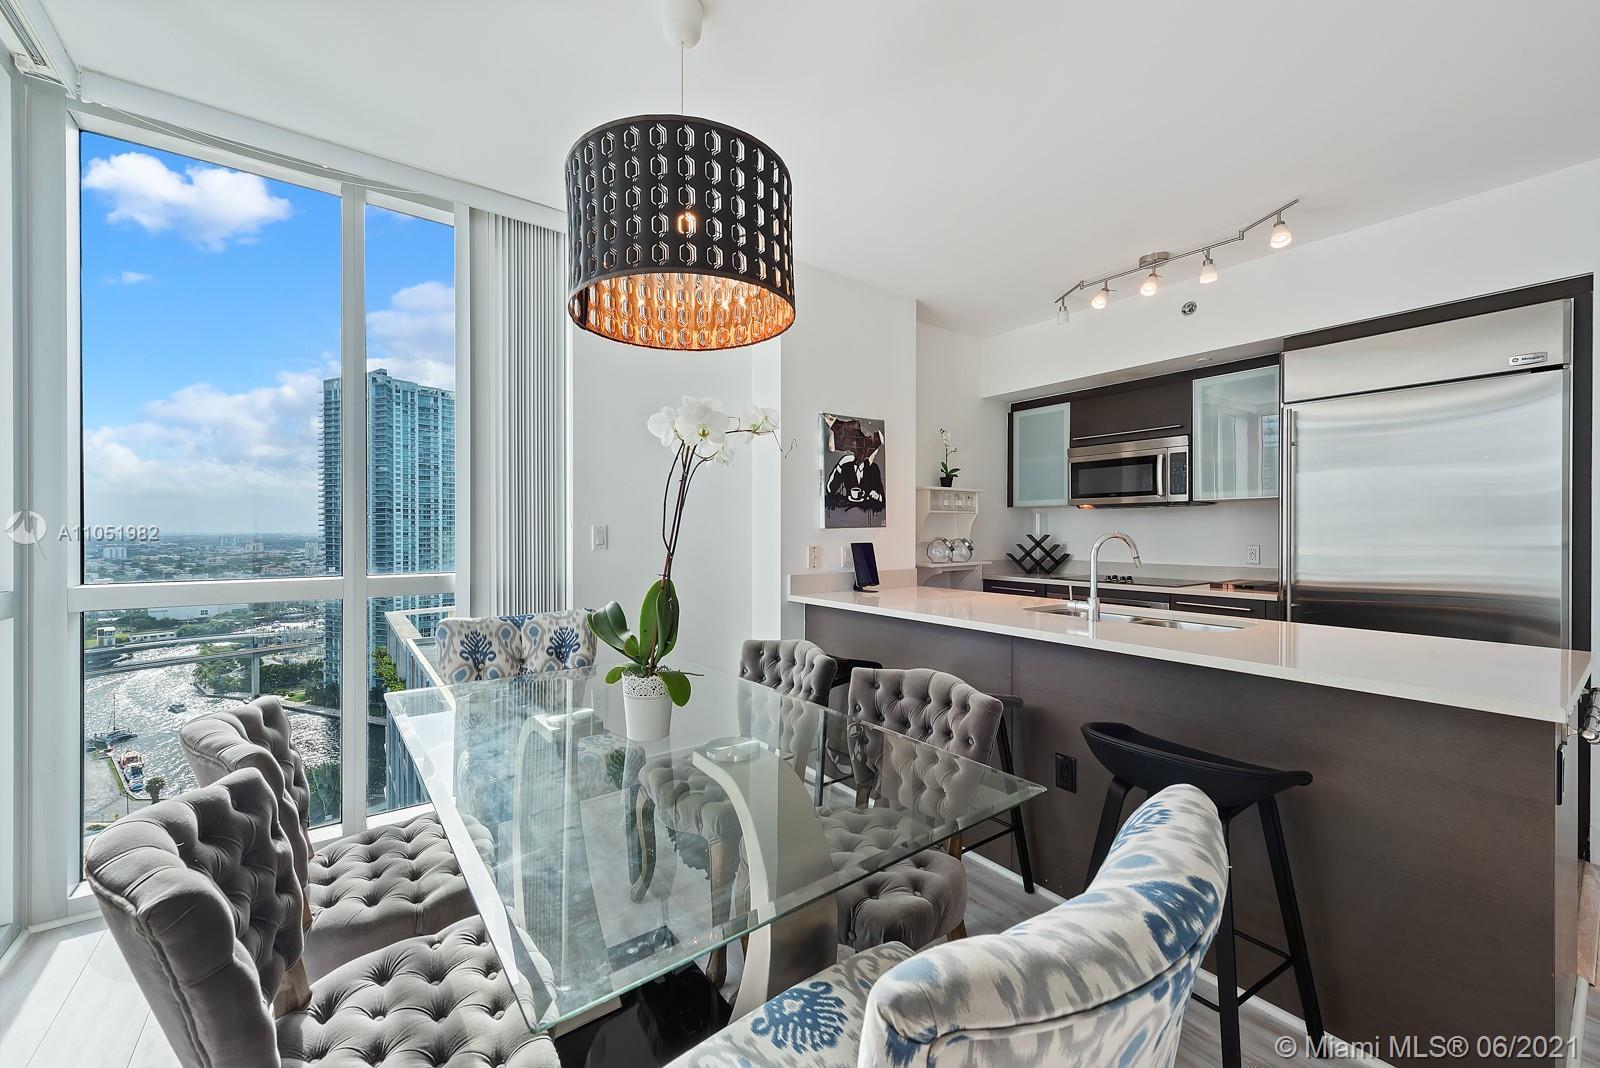 500 Brickell East Tower #2902 - 55 SE 6th St #2902, Miami, FL 33131